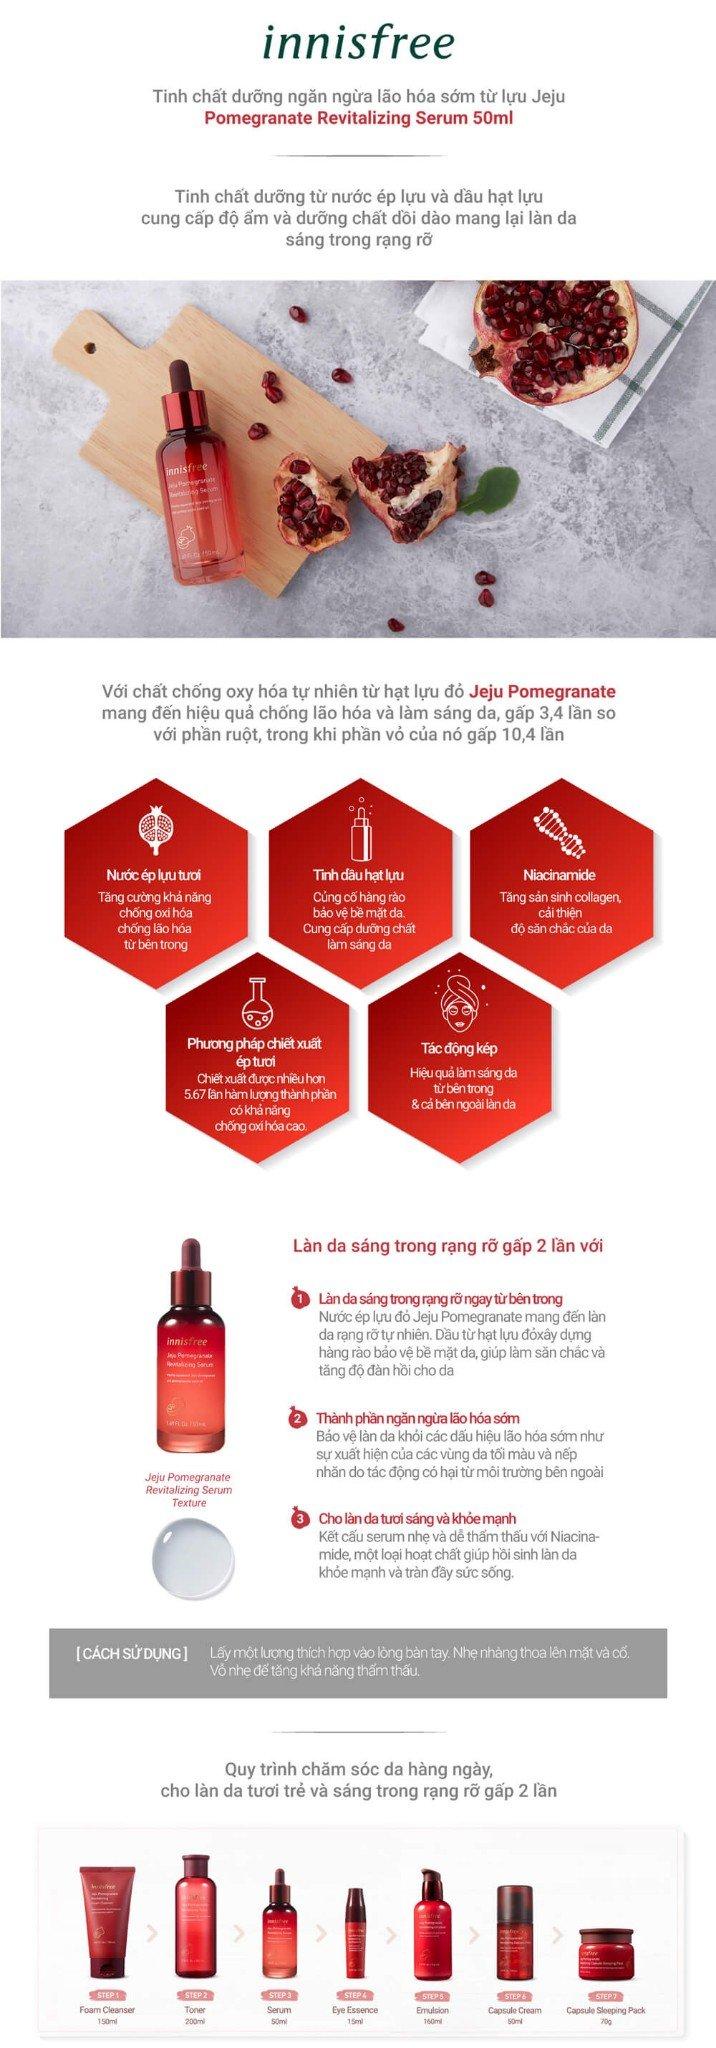 Innisfree Jeju Pomegranate Revitalizing Serum 50ml